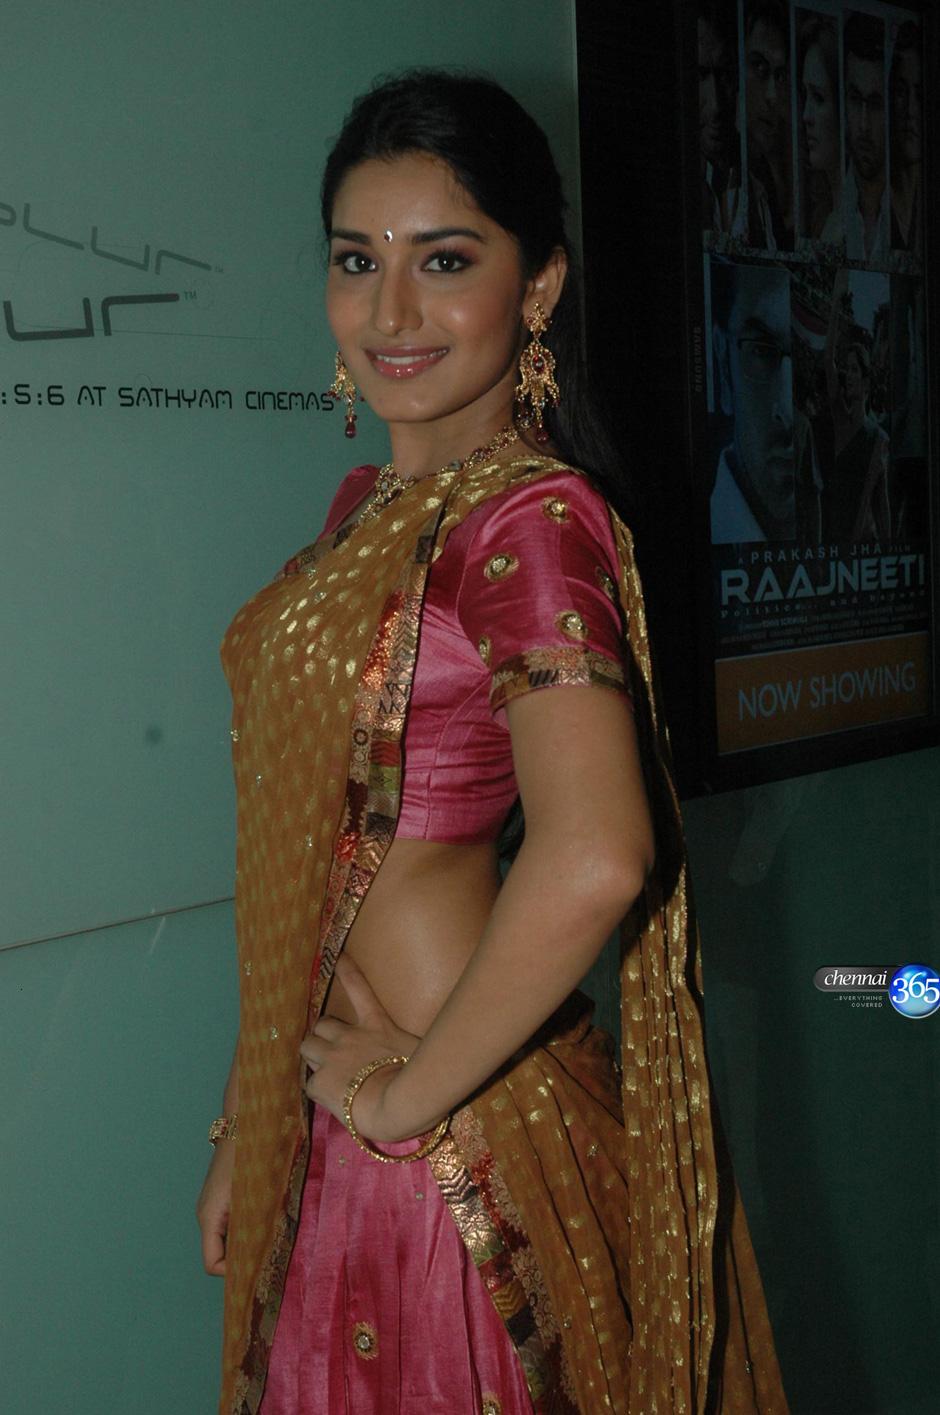 Wallpaper World Beautiful Indian Girl In Pink Saree-8744